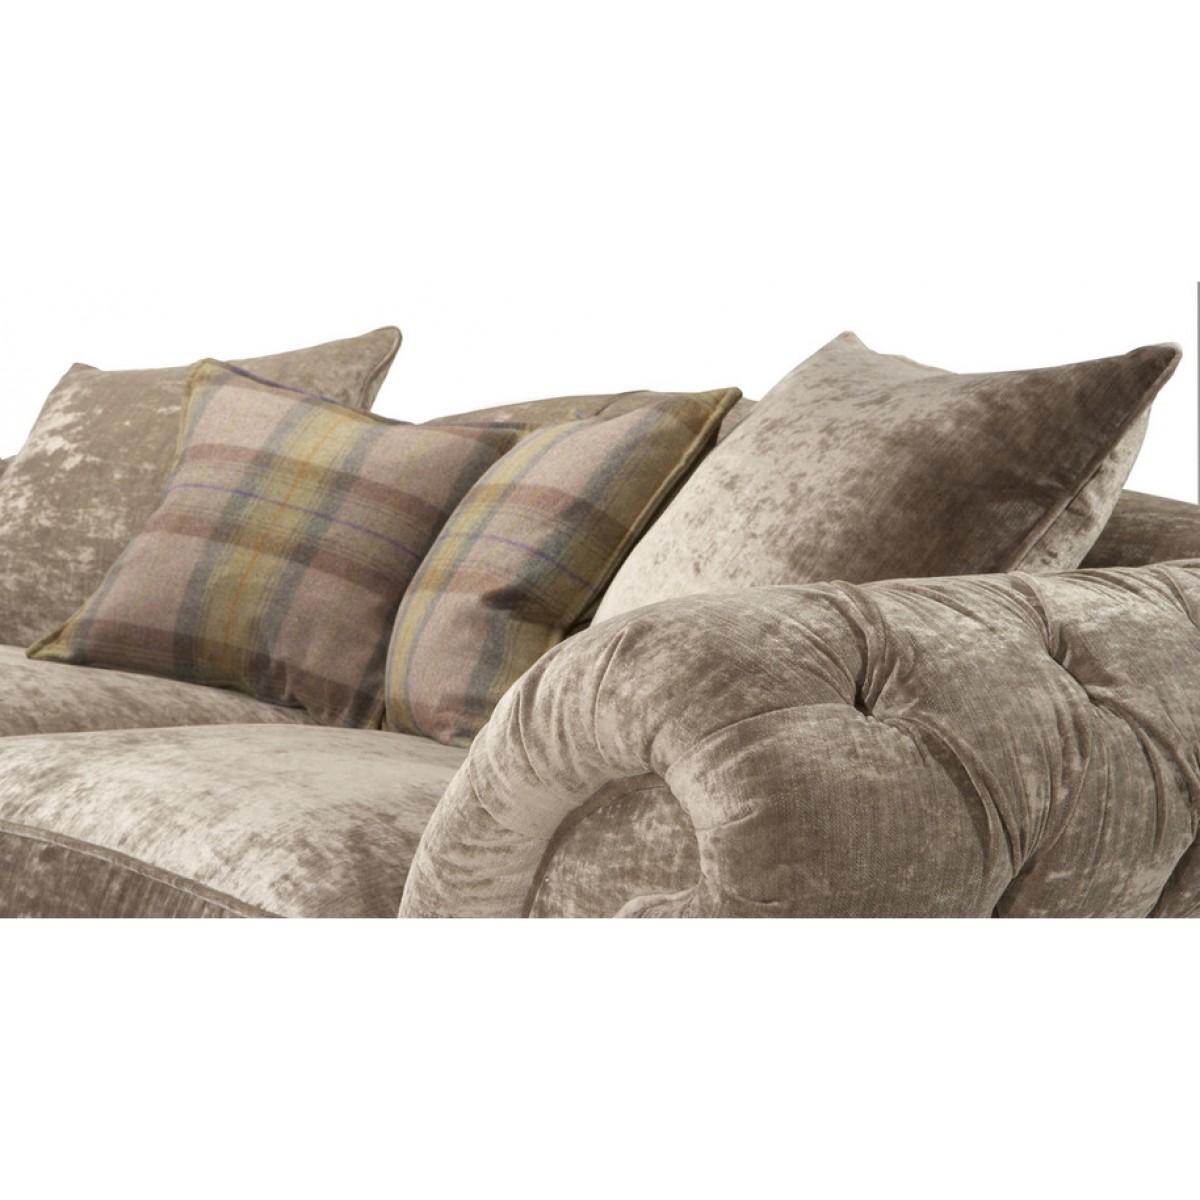 ensemble de canap s albi chesterfield personnalisable lin ou mircrofi. Black Bedroom Furniture Sets. Home Design Ideas